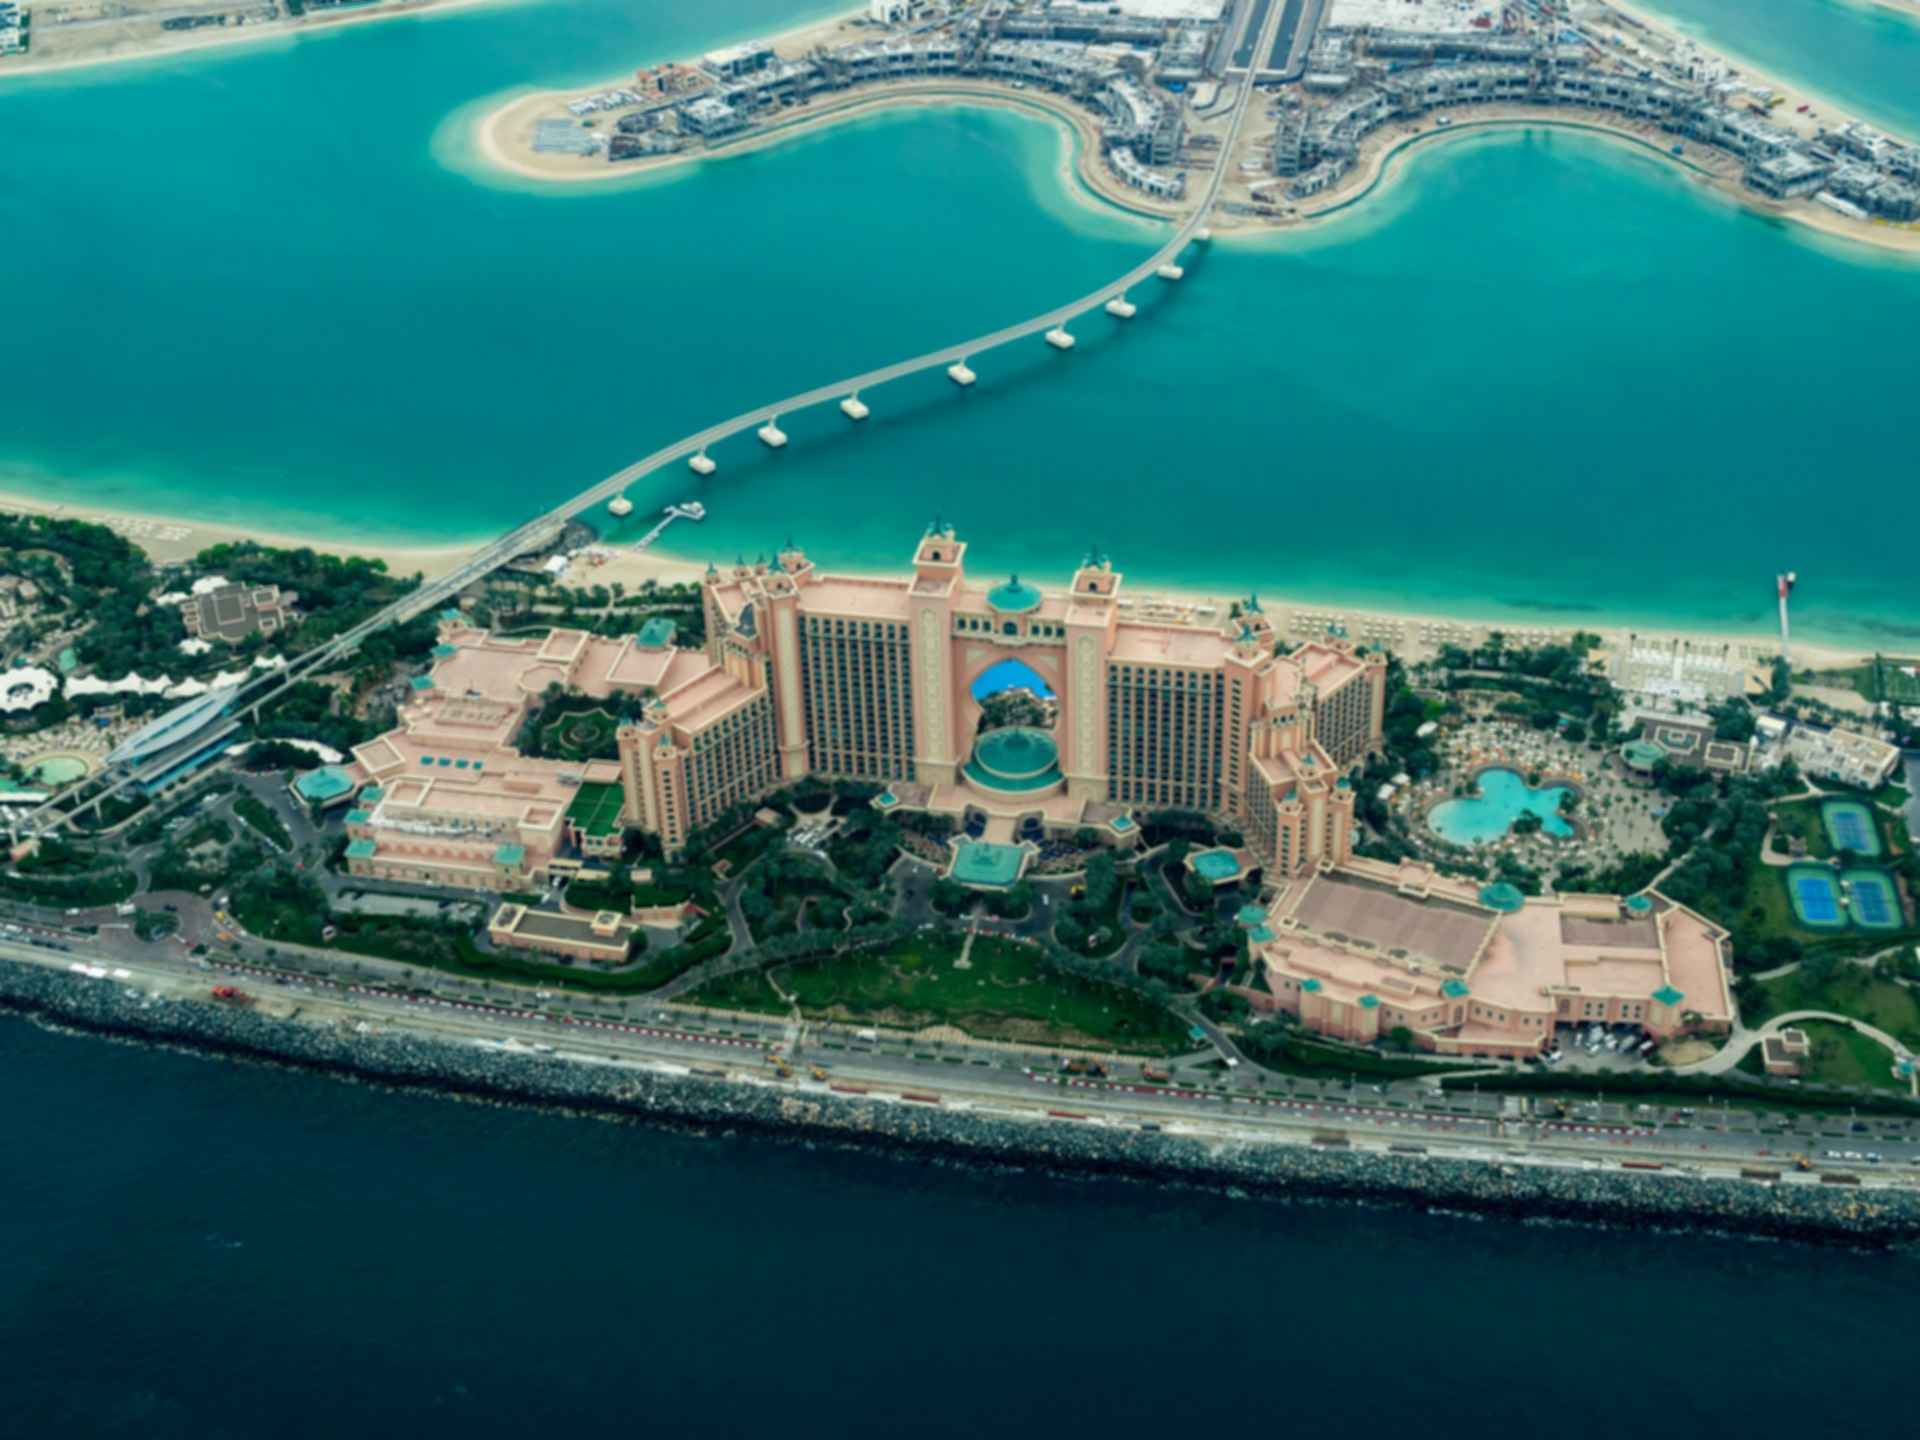 Atlantis, The Palm - Bird's Eye View